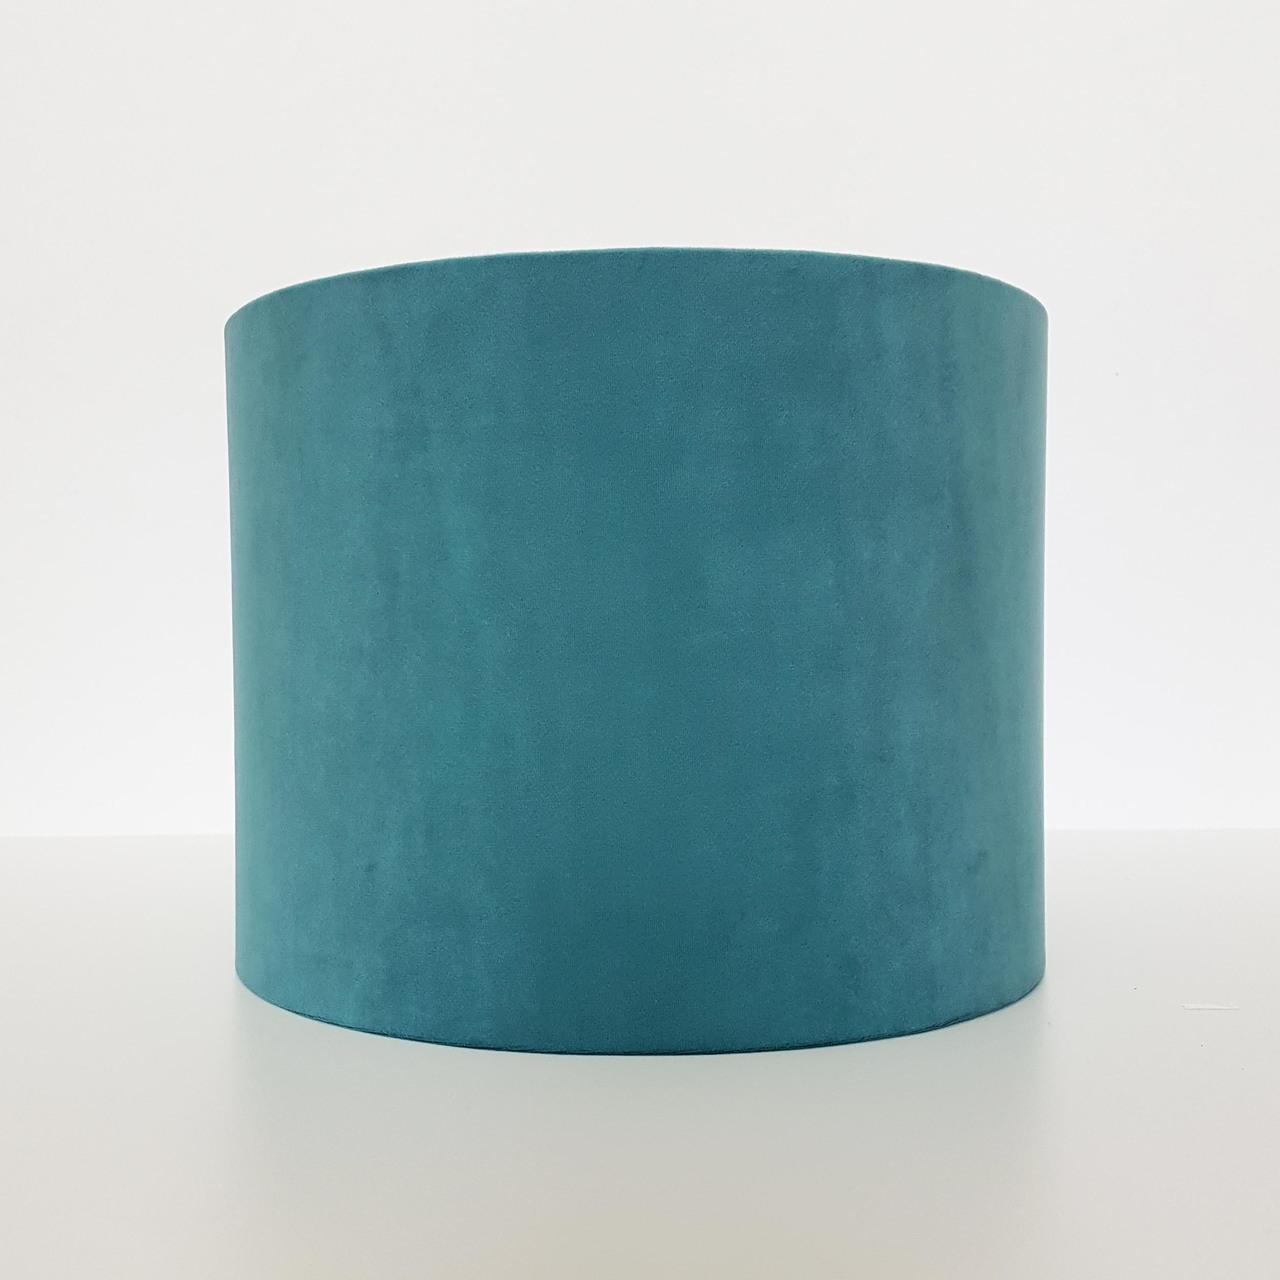 Soft Teal Blue Velvet Lightshade